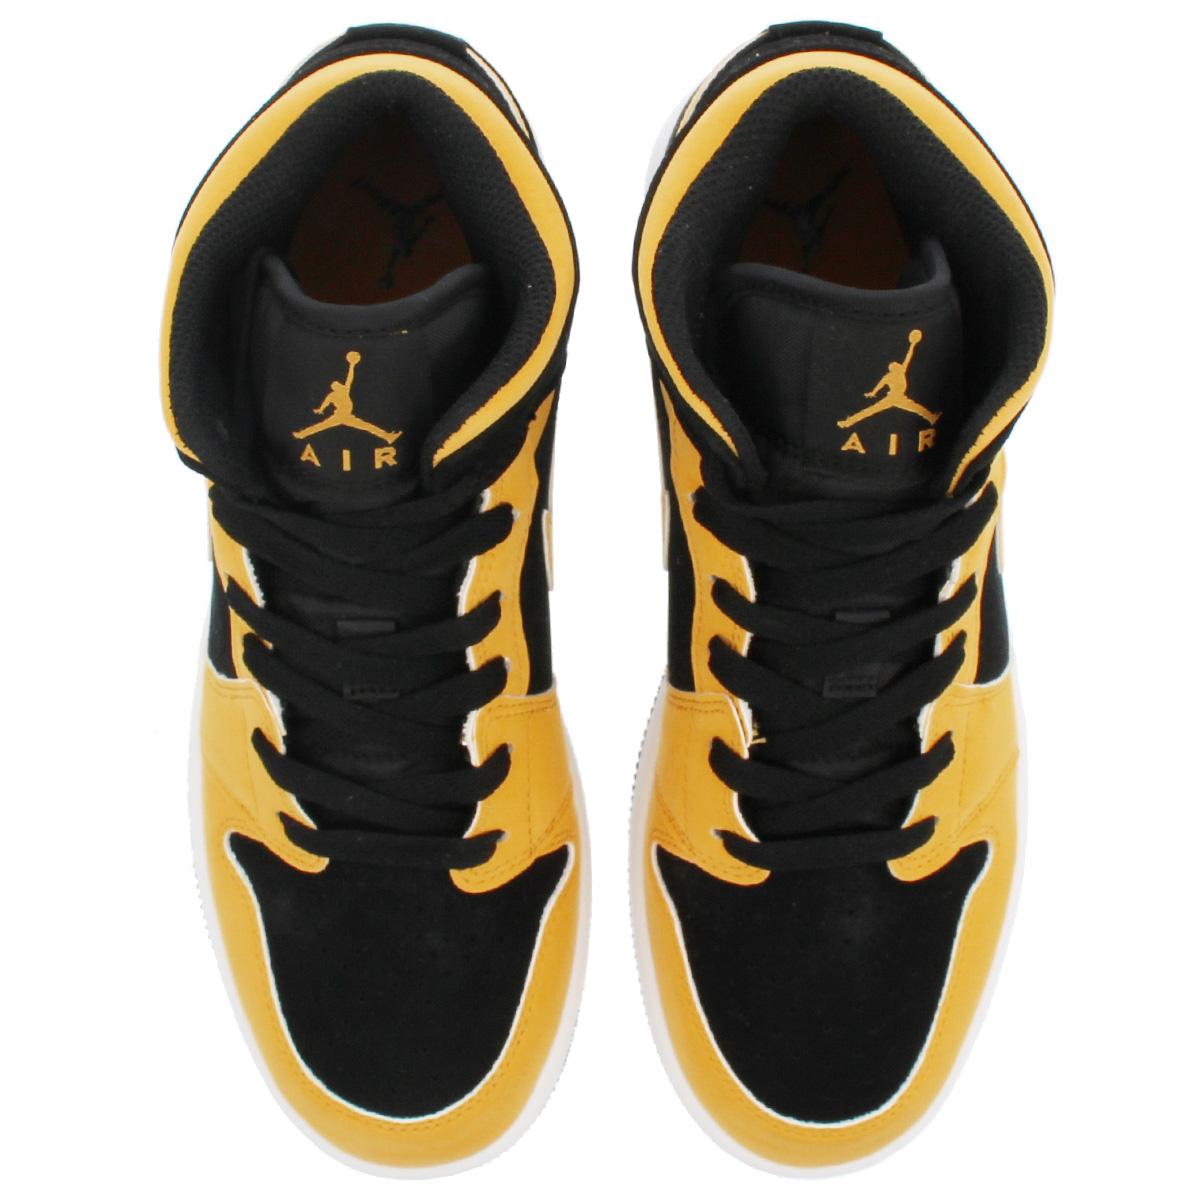 80c7090b75d ... NIKE AIR JORDAN 1 MID BG Nike Air Jordan 1 mid BG BLACK/UNIVERSITY GOLD  ...